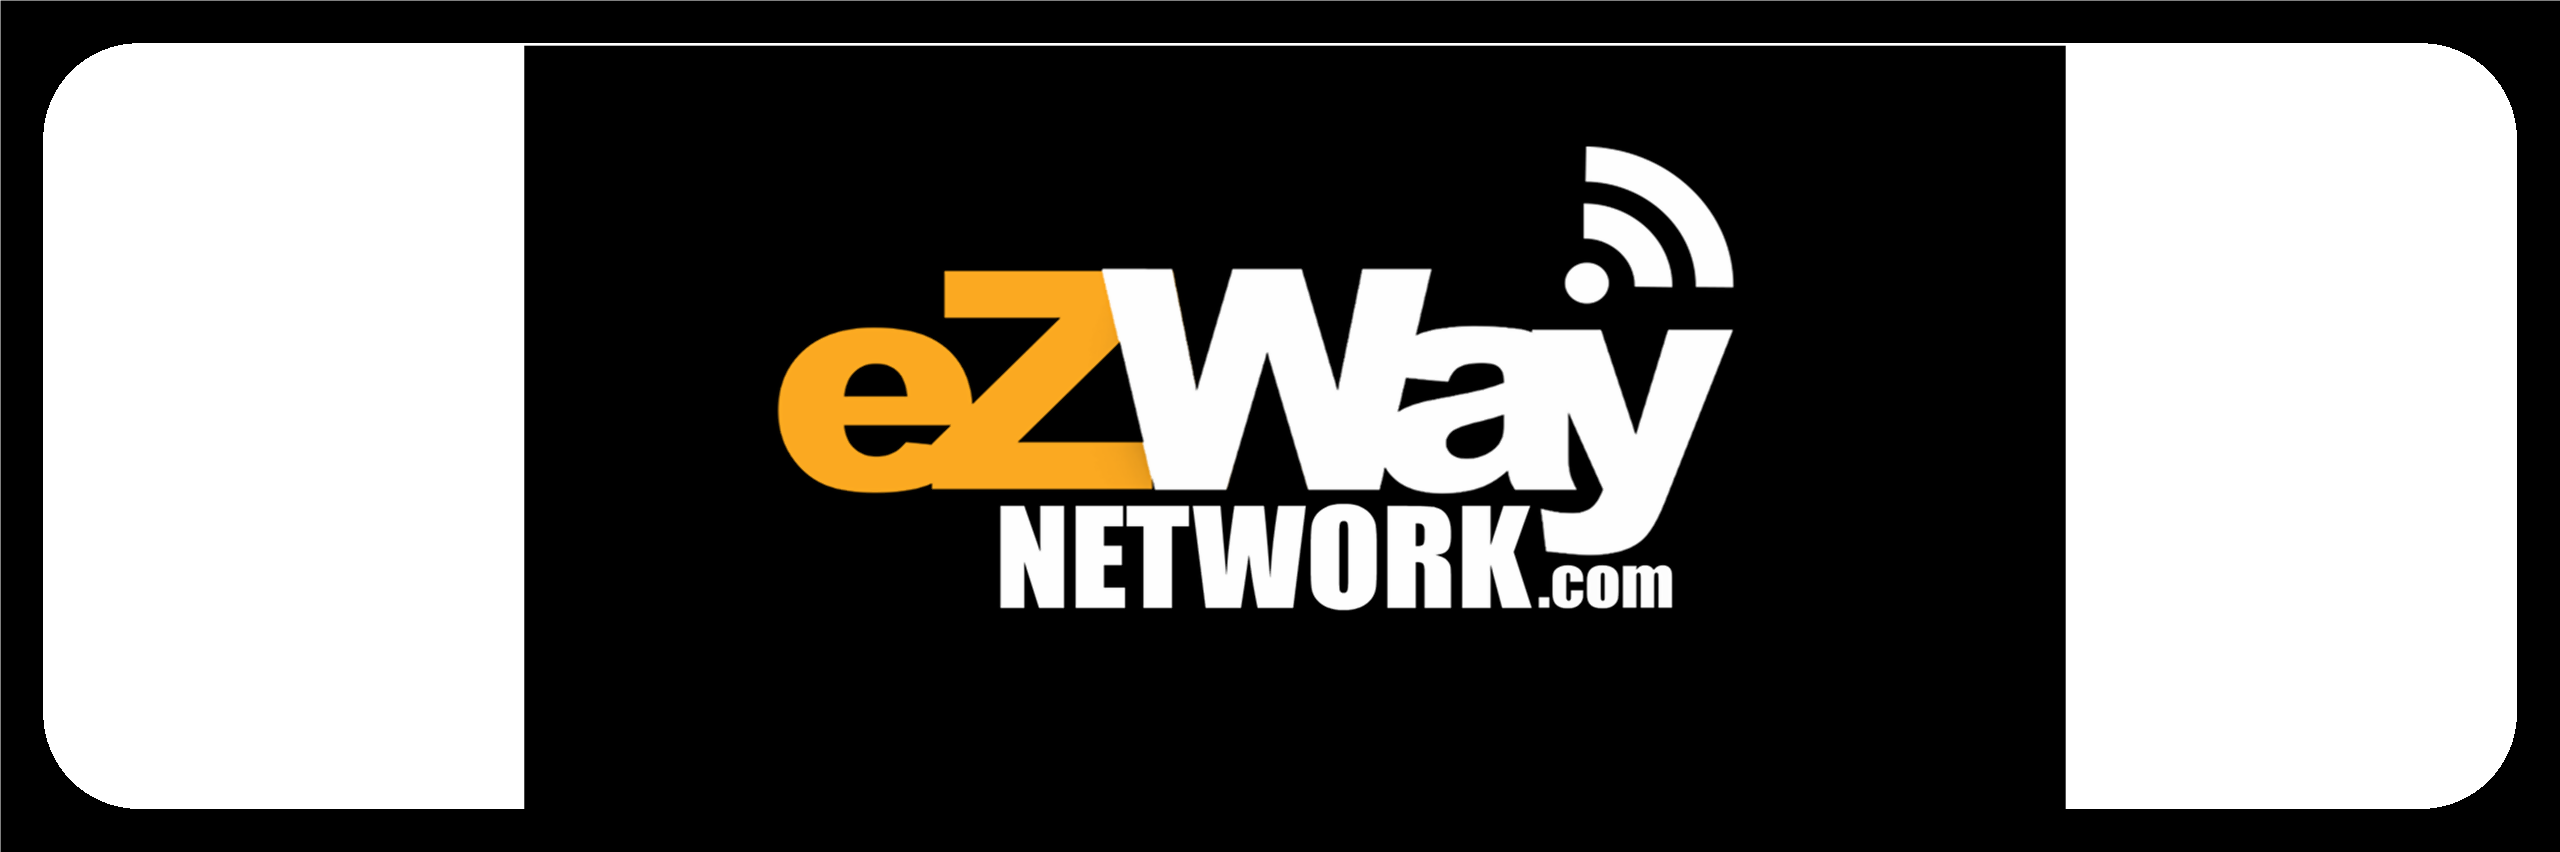 eZWayTV